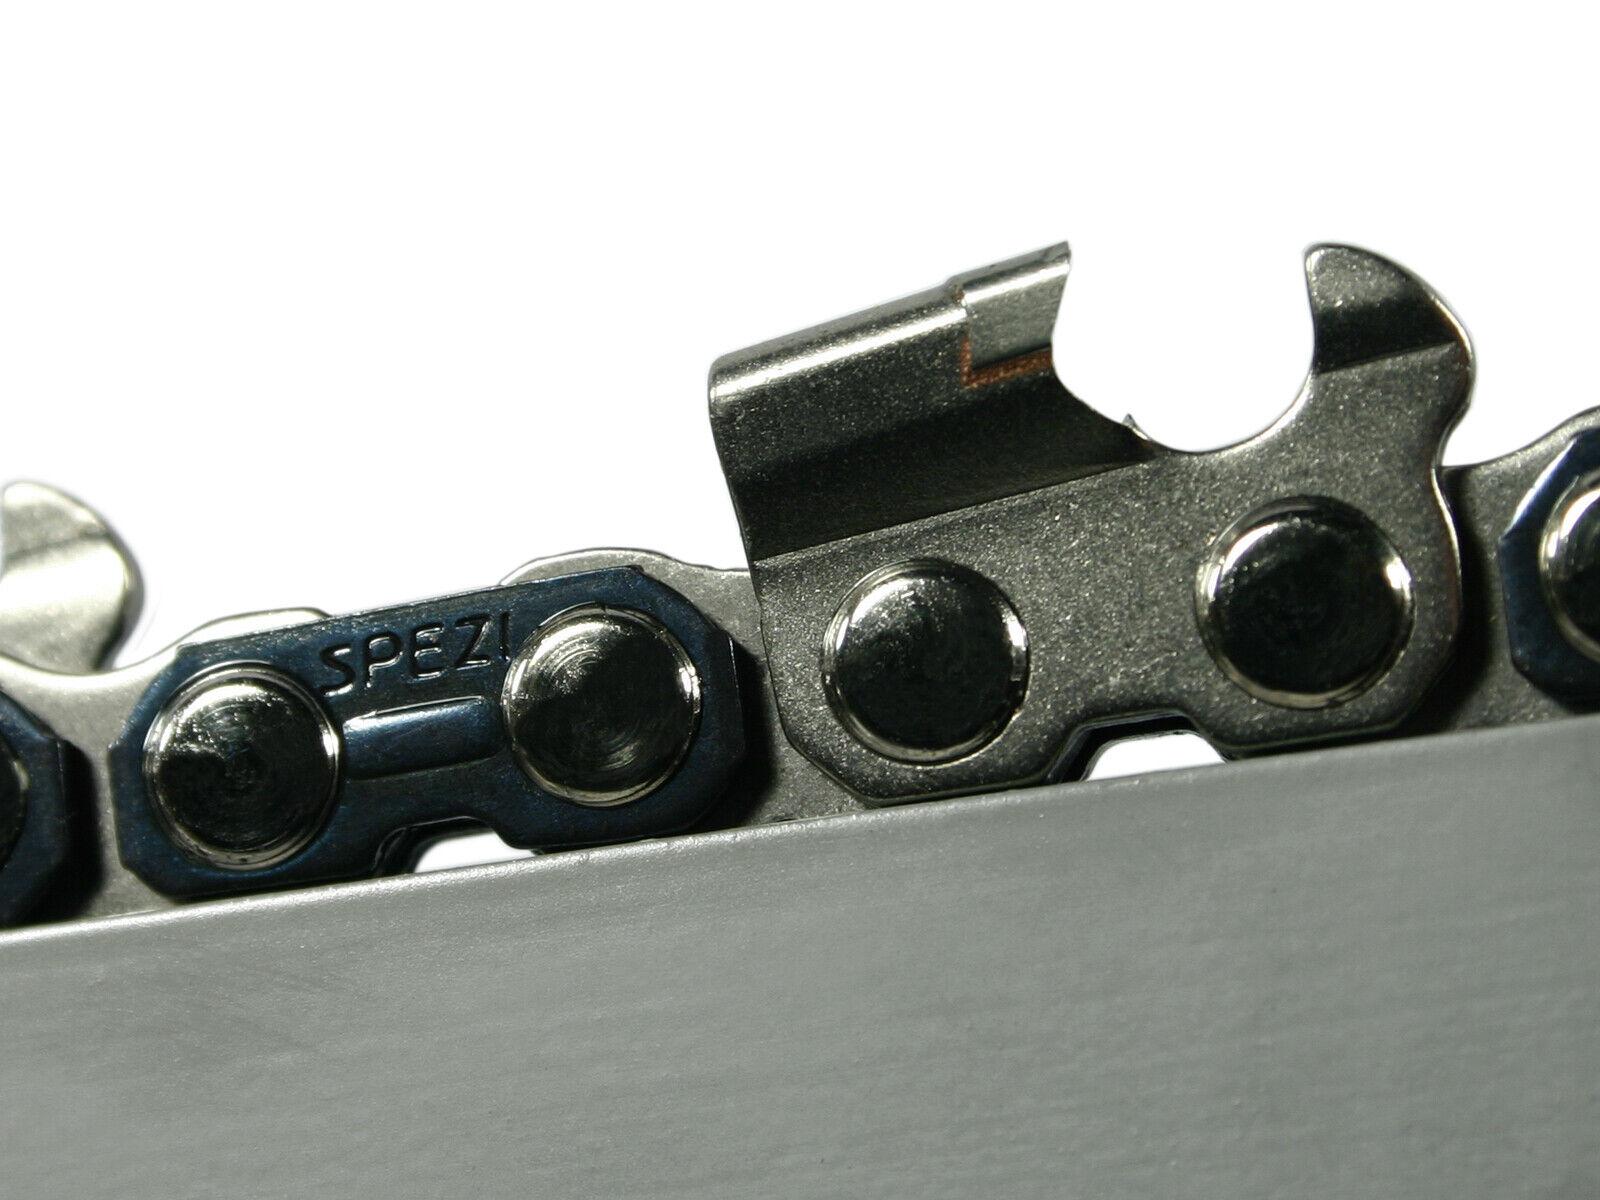 Metal duro para sierra cadena compatible con still 050 051 Av 120cm 404  138tg 1,6mm Cochebide